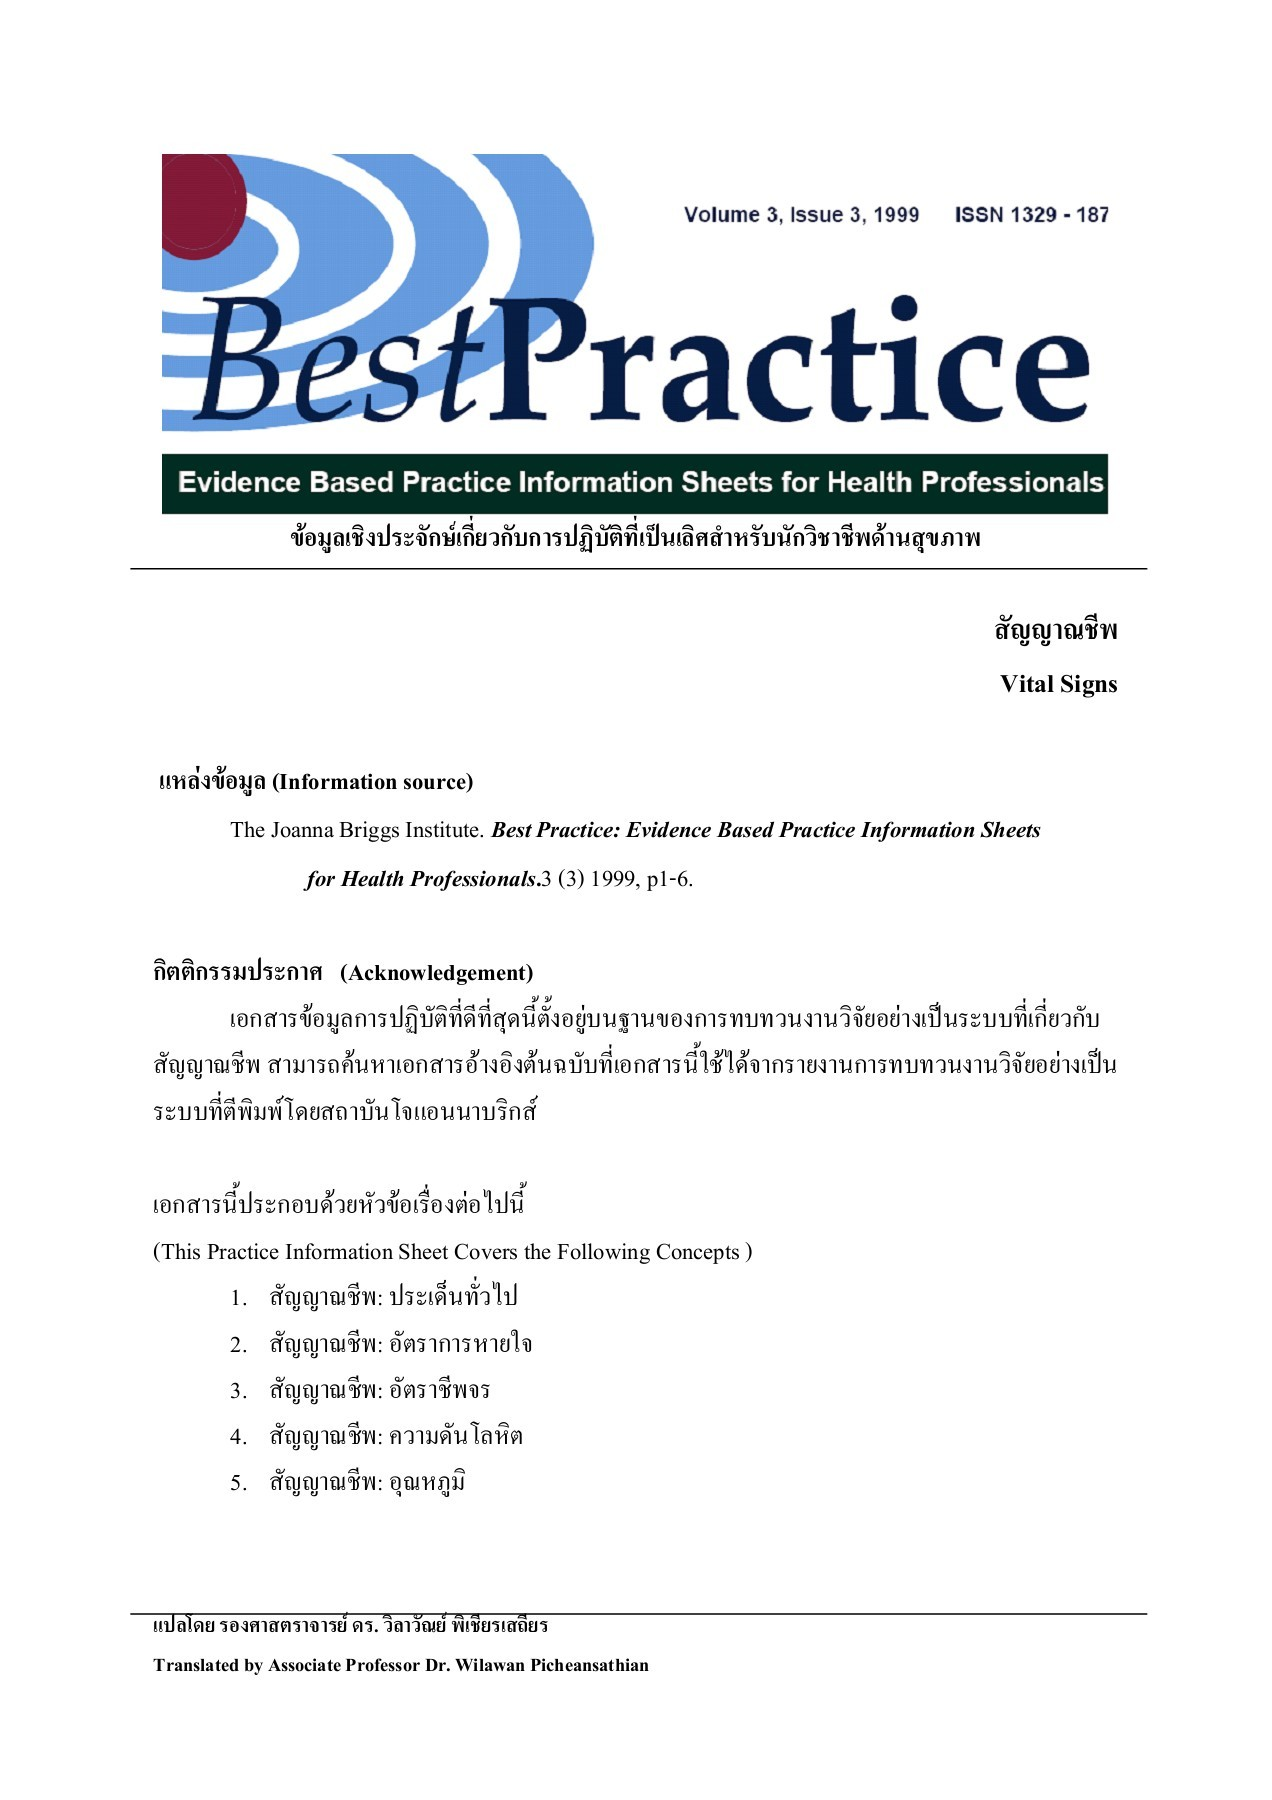 Best Practice Evidence Based Information Sheets For Health